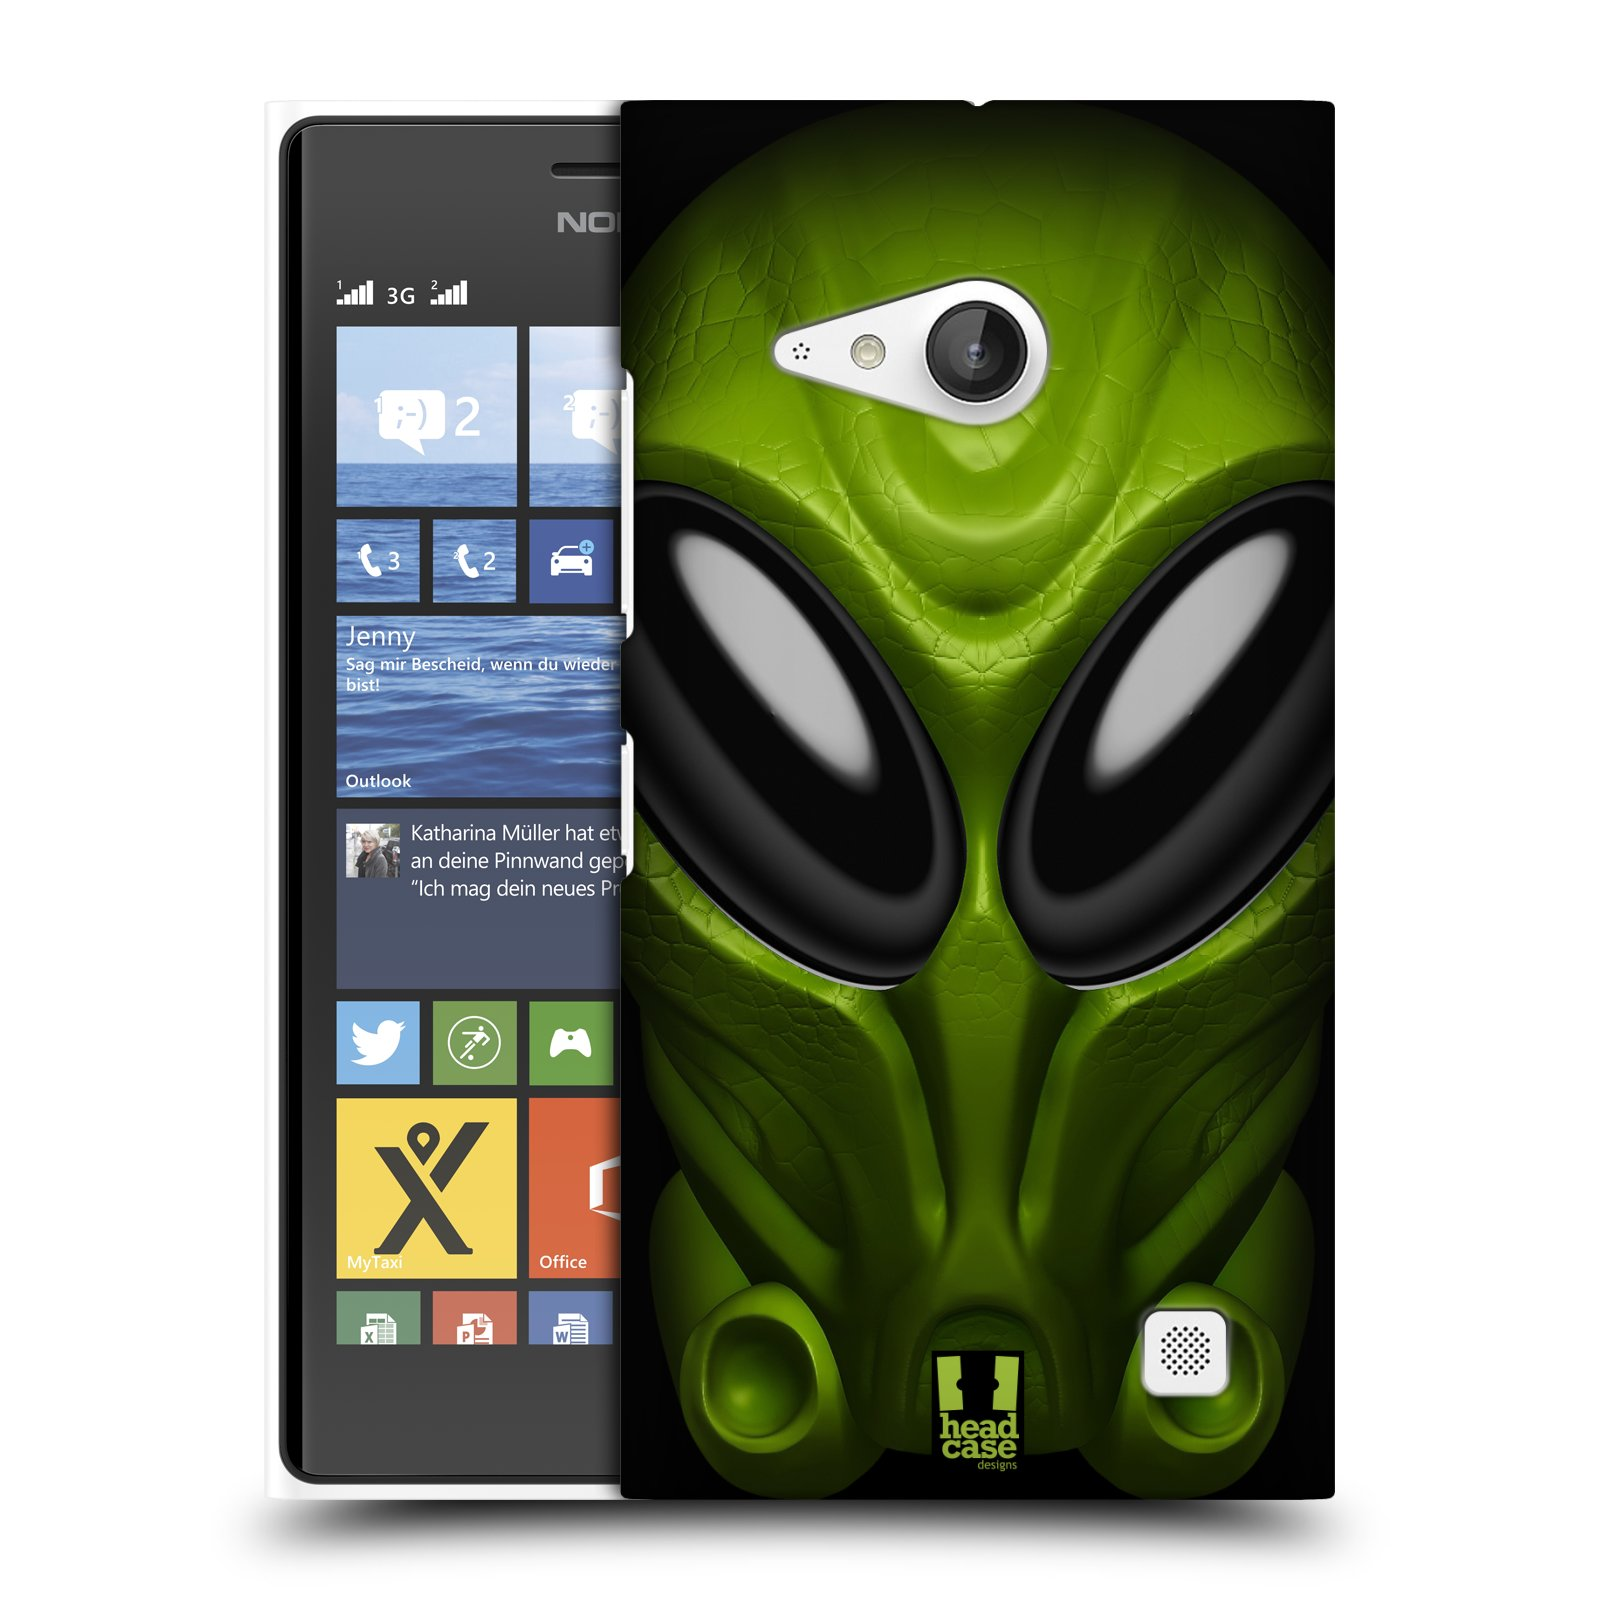 Plastové pouzdro na mobil Nokia Lumia 730 Dual SIM - Head Case - Ufoun Mastermind (Plastový kryt či obal na mobilní telefon s motivem Ufouna Masterminda pro Nokia Lumia 730 Dual SIM)